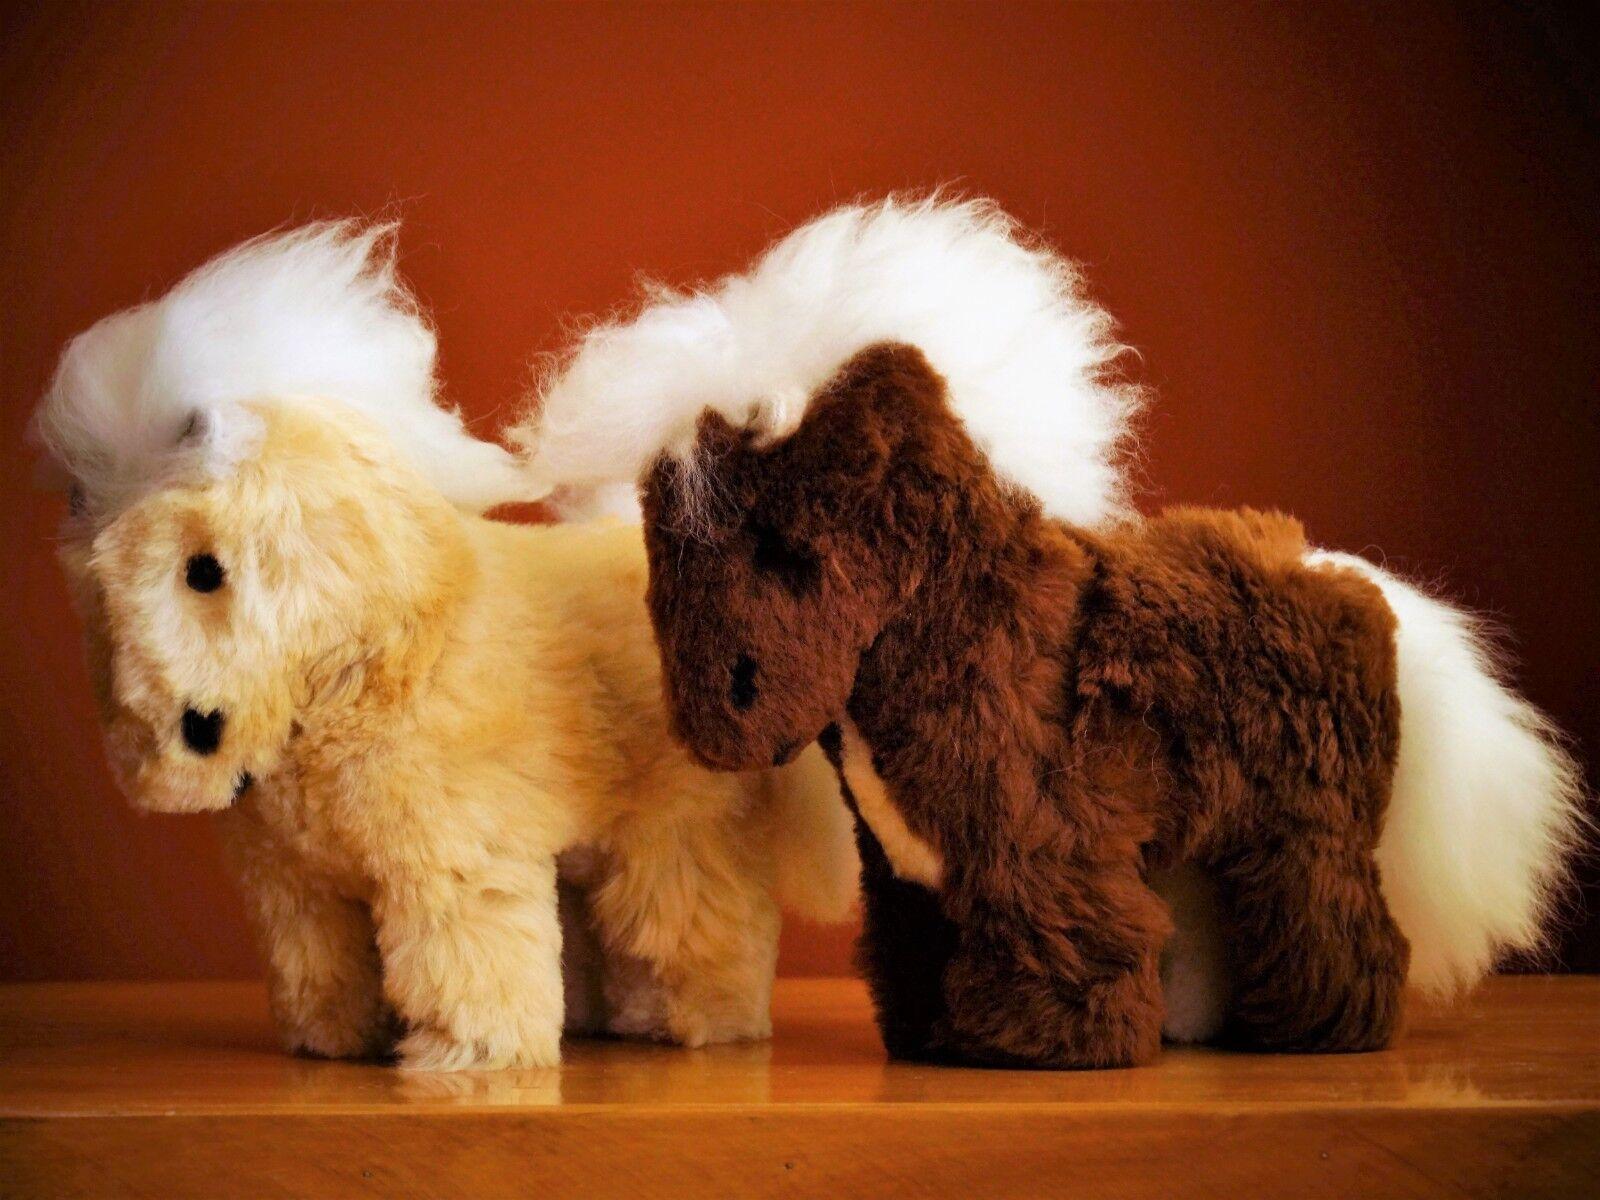 20 Handmade, Alpaca Fur Toy Horse, Poney, Teddy Bear, Soft, Gifts, Anti stress